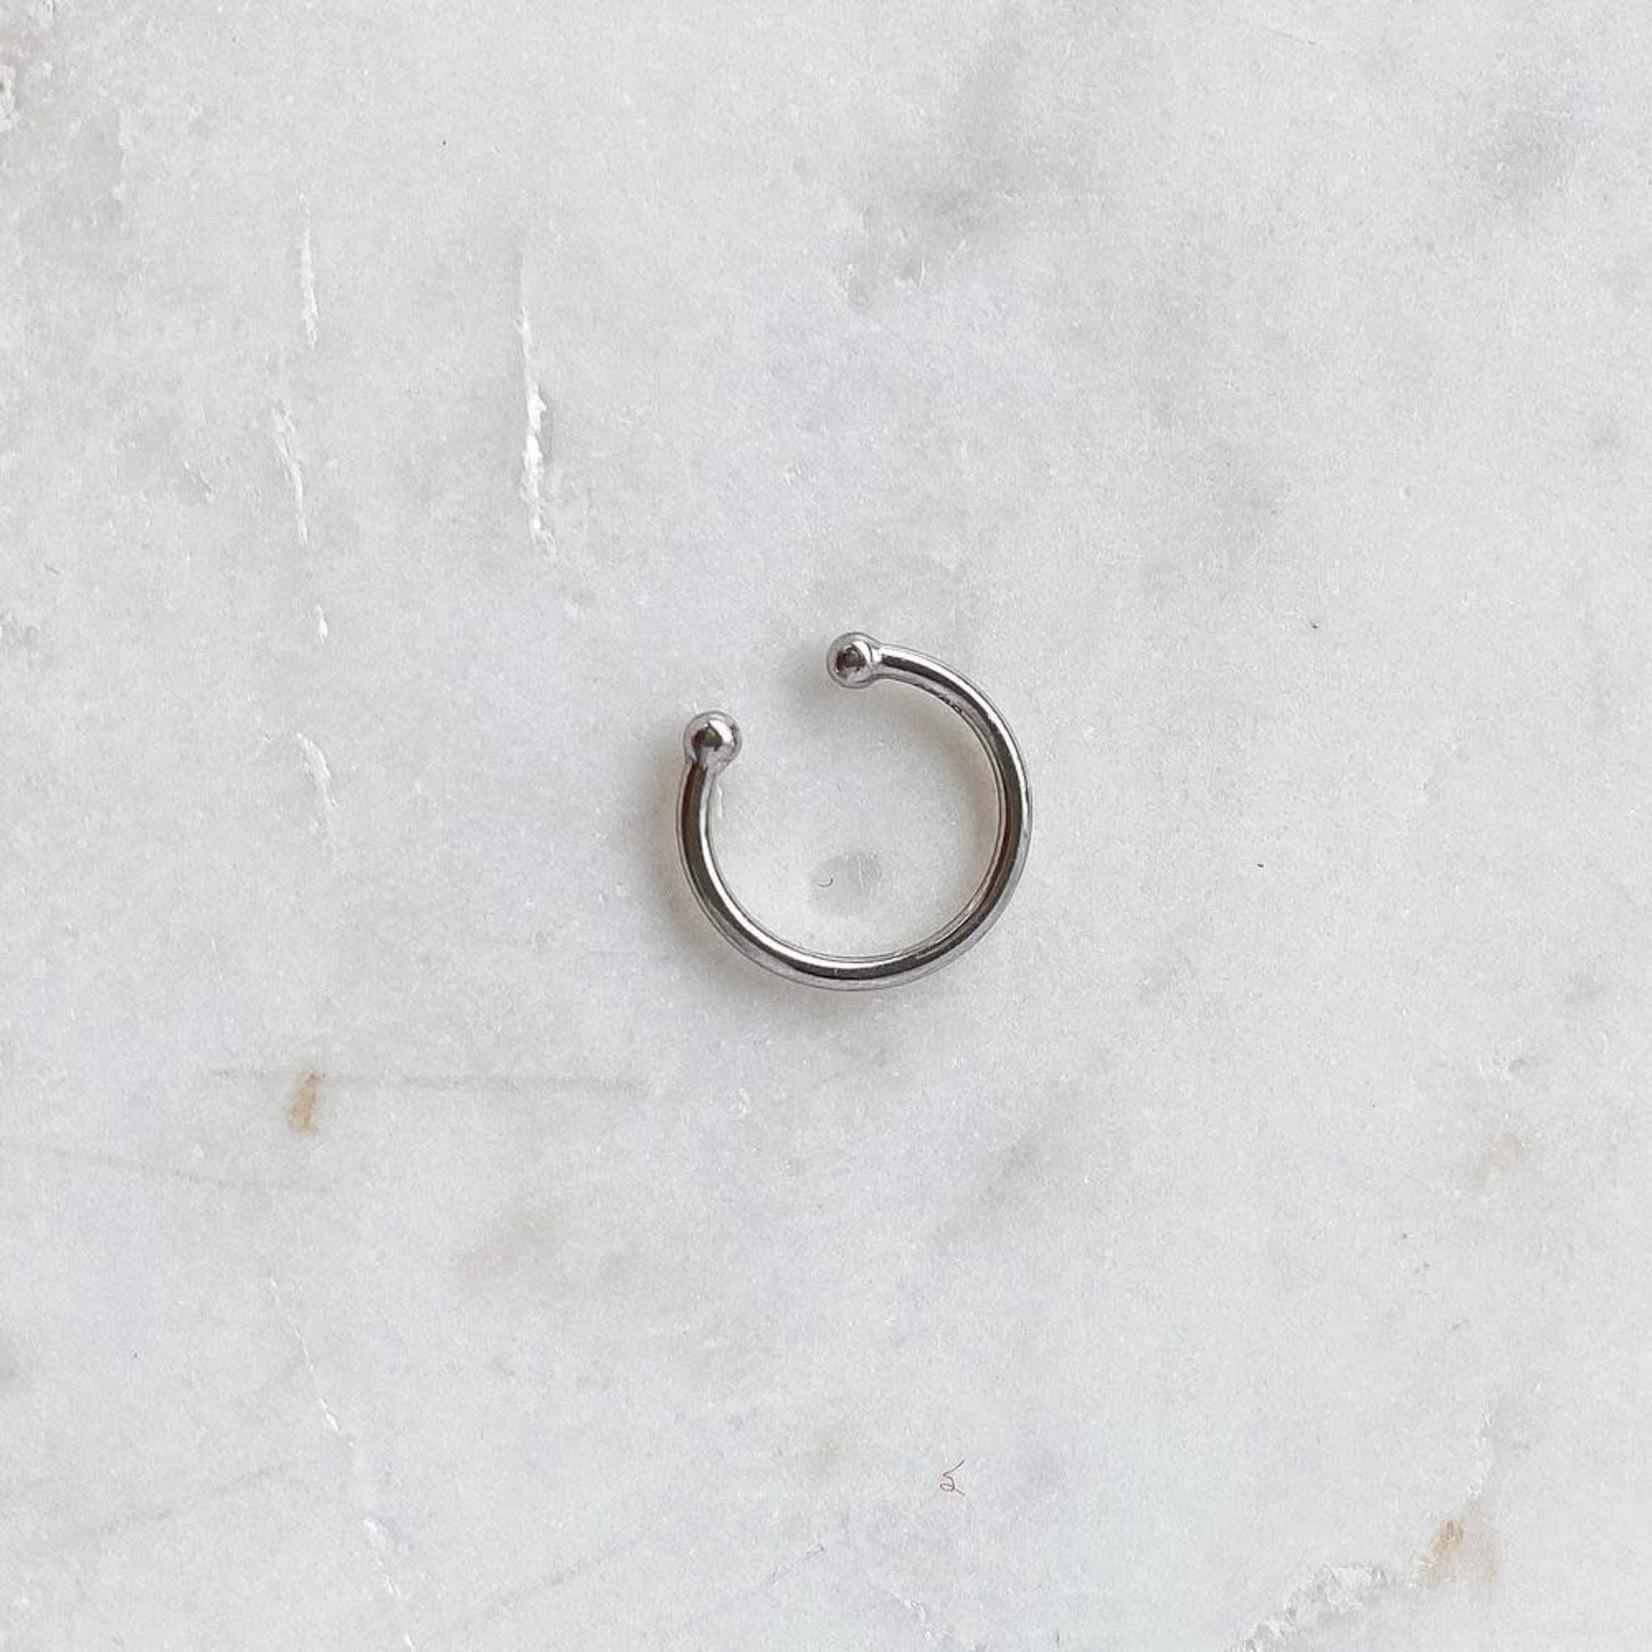 Horace Jewelry Horace fausse boucle d'oreille BASIC ARGENT